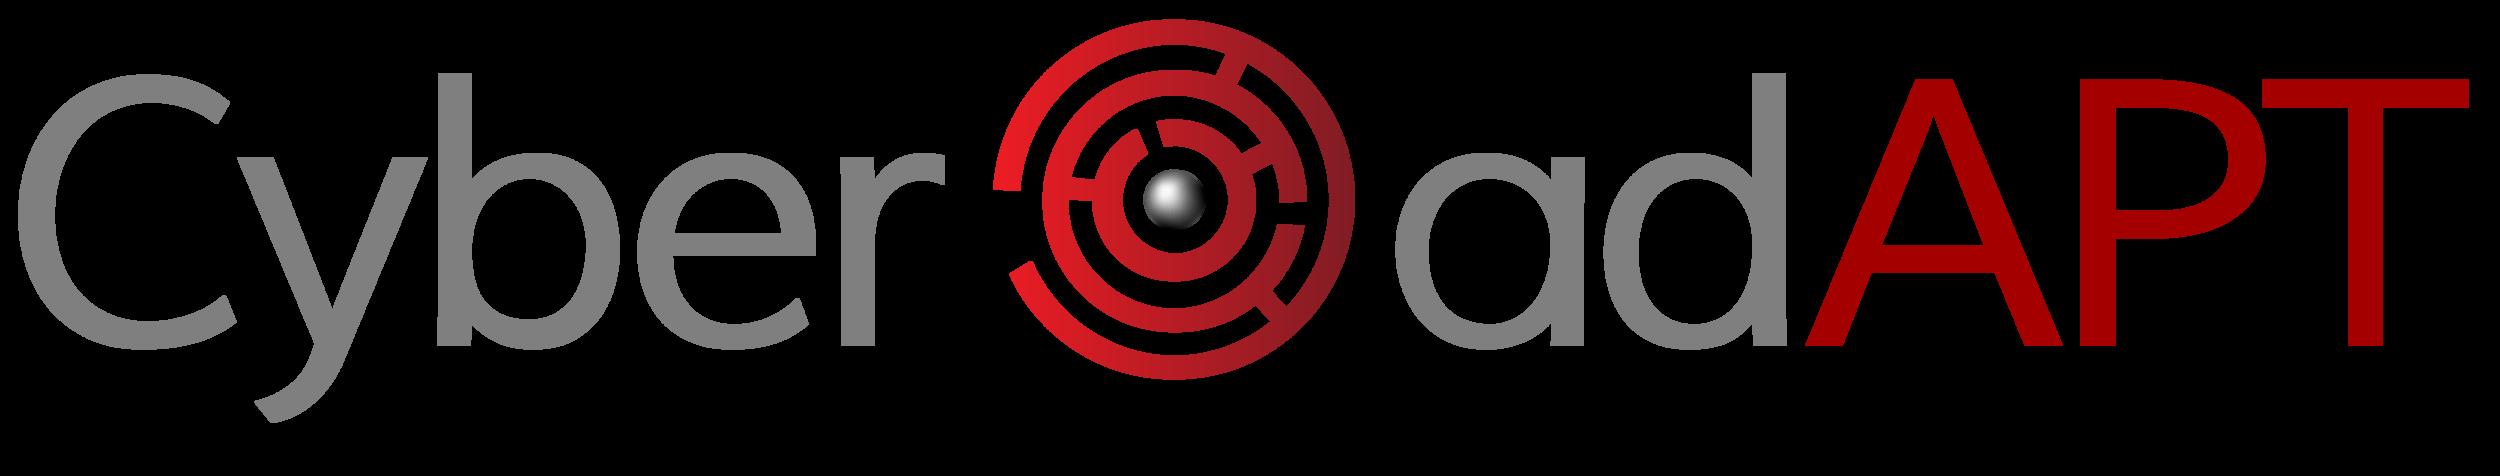 cyberadapt_logo_x_large-01_300dpi copy.png